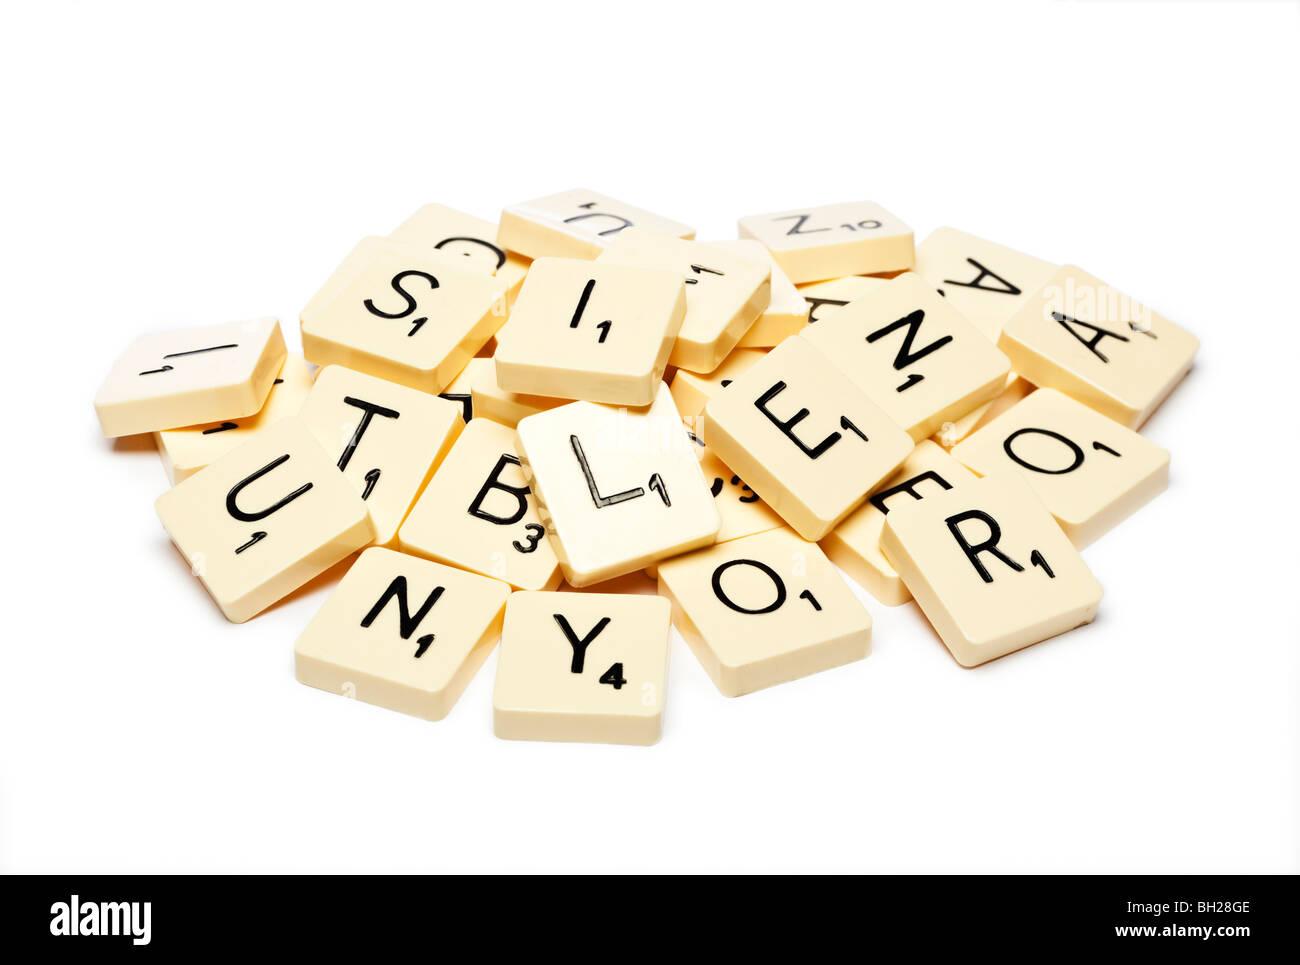 Scrabble tiles - Stock Image